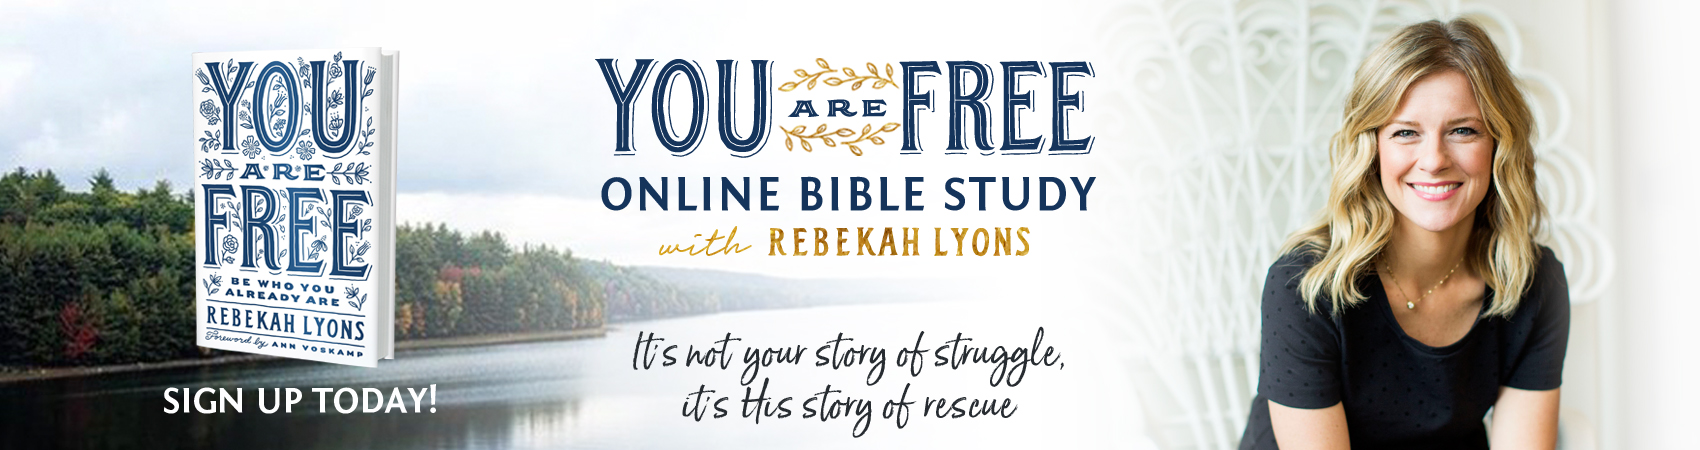 Online Bible Studies   Proverbs 31 Ministries